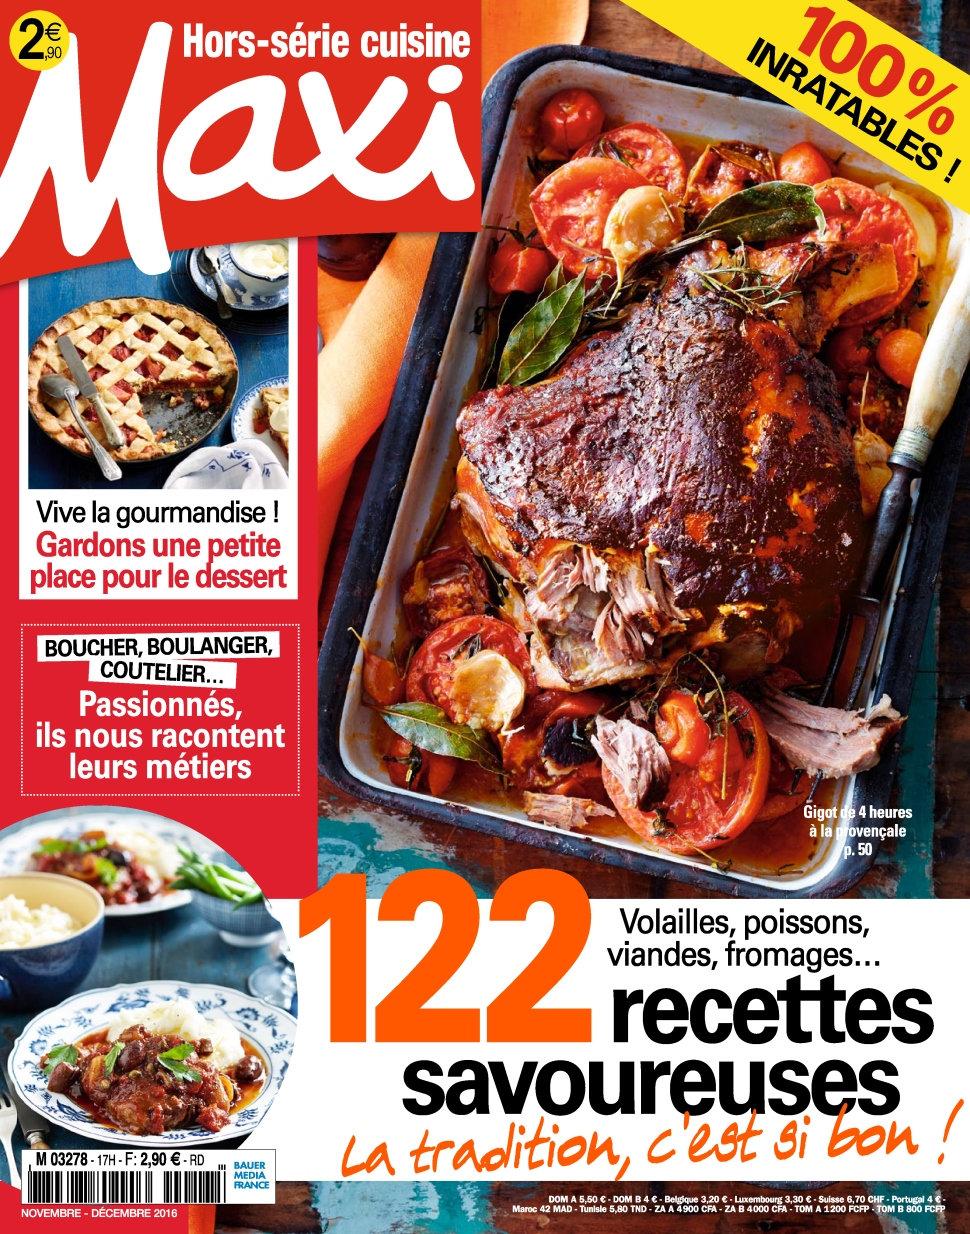 Maxi Hors Série Cuisine N°31 - Novembre/Decembre 2016